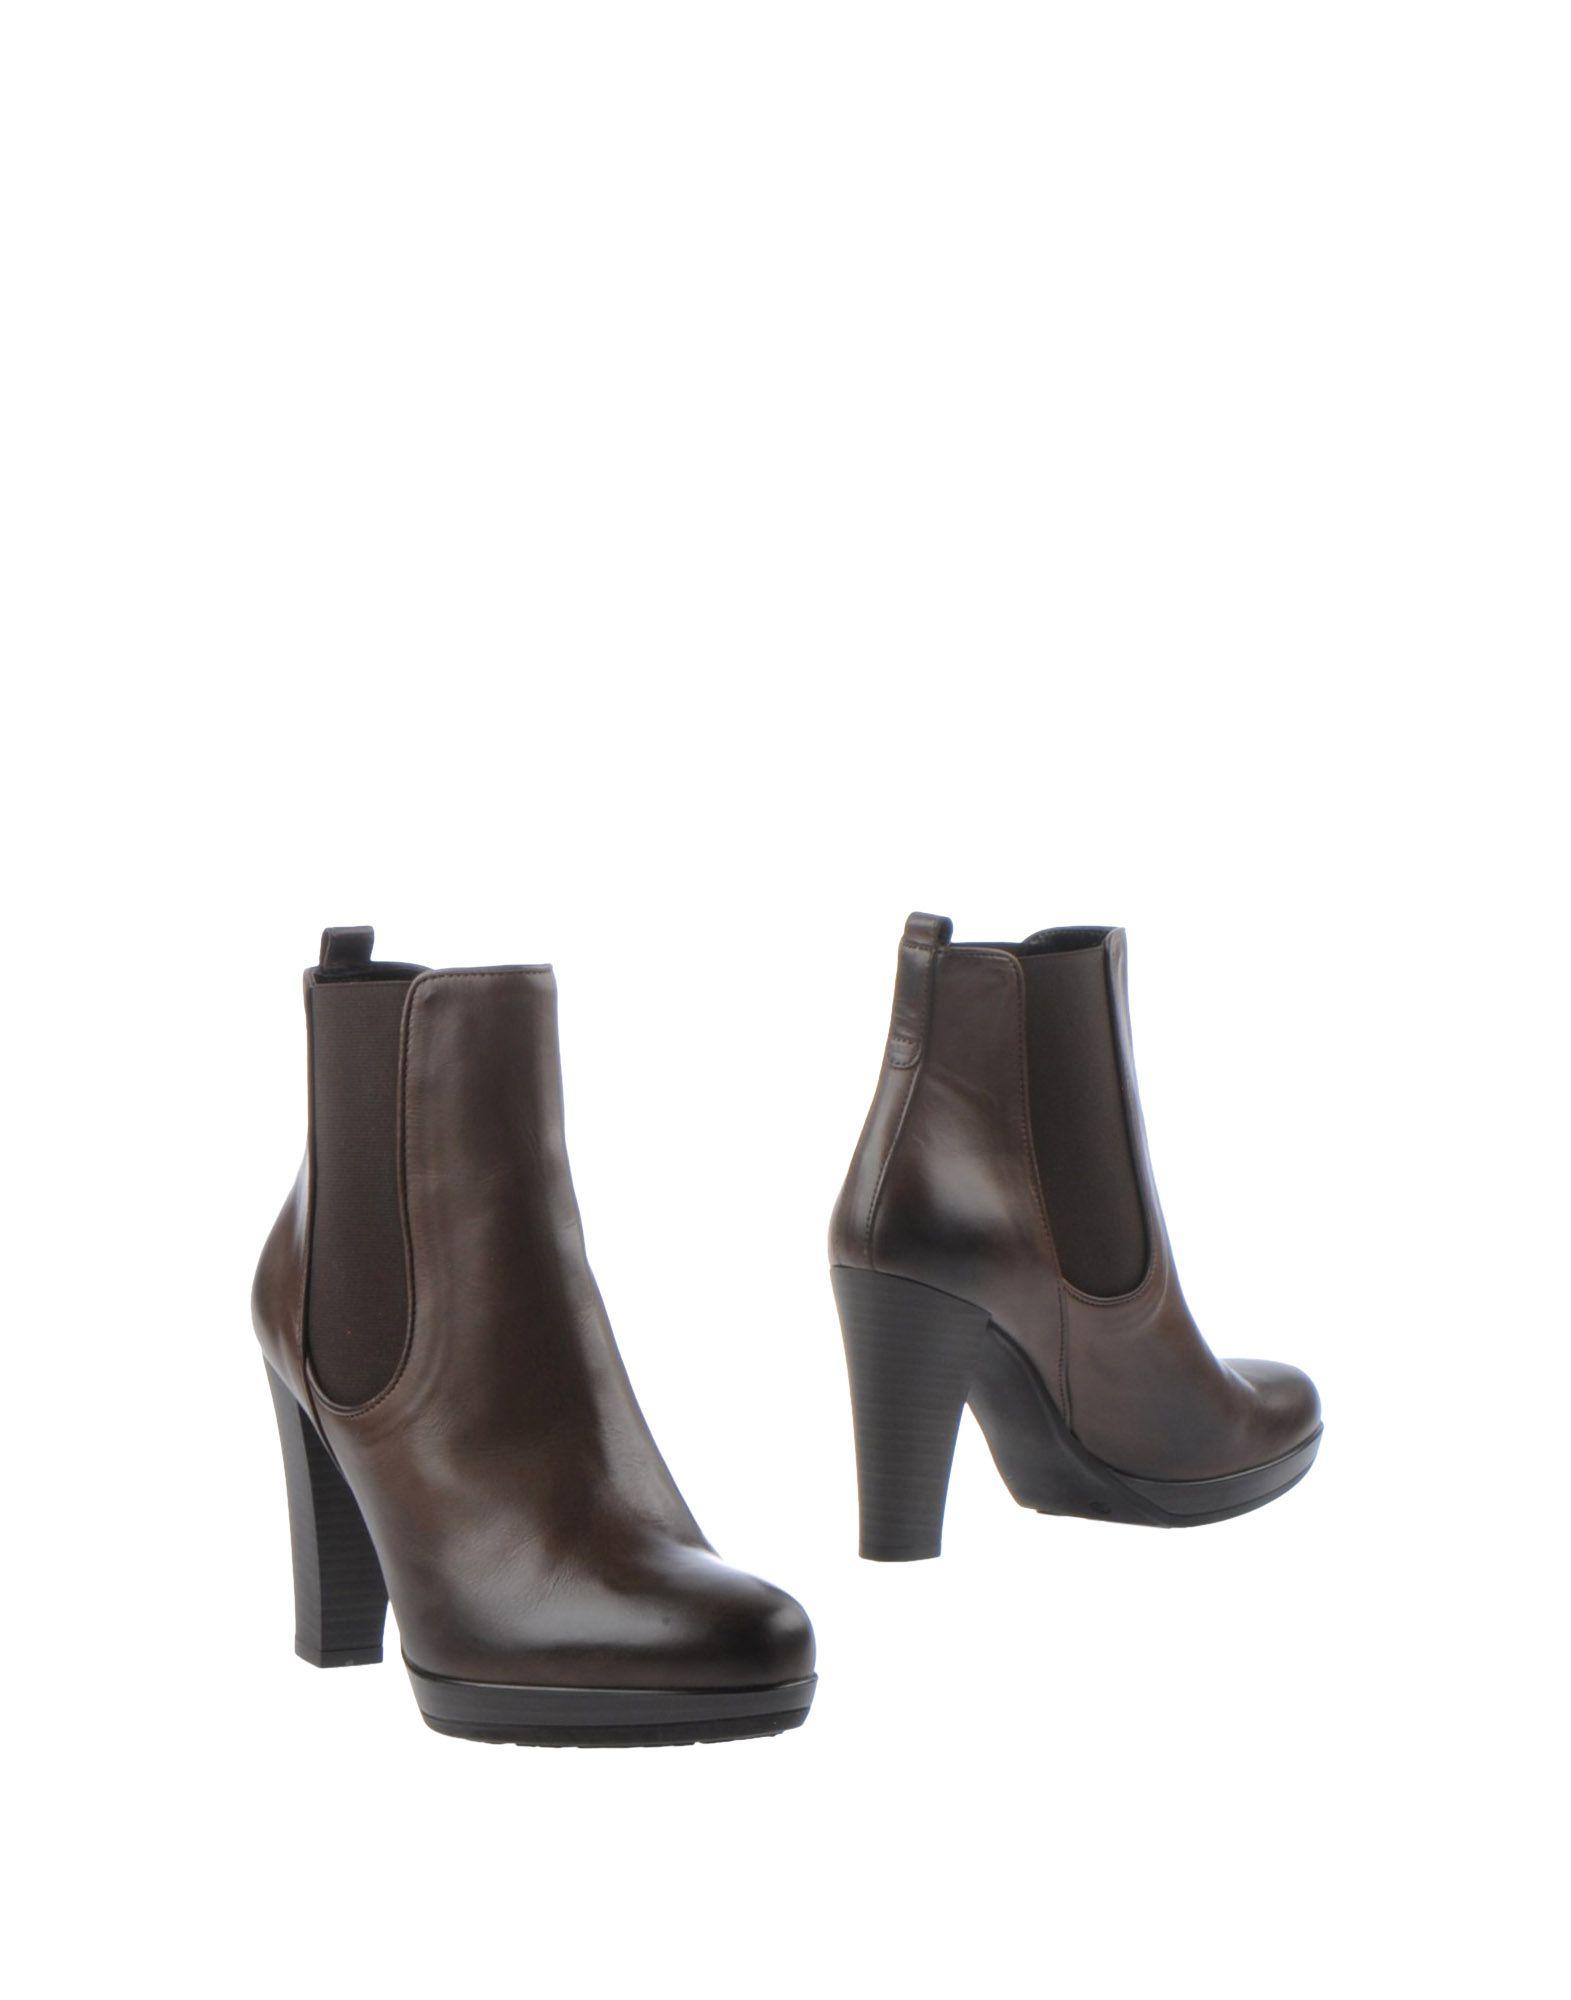 Maria Cristina Stiefelette Damen  44664273POGut aussehende strapazierfähige Schuhe